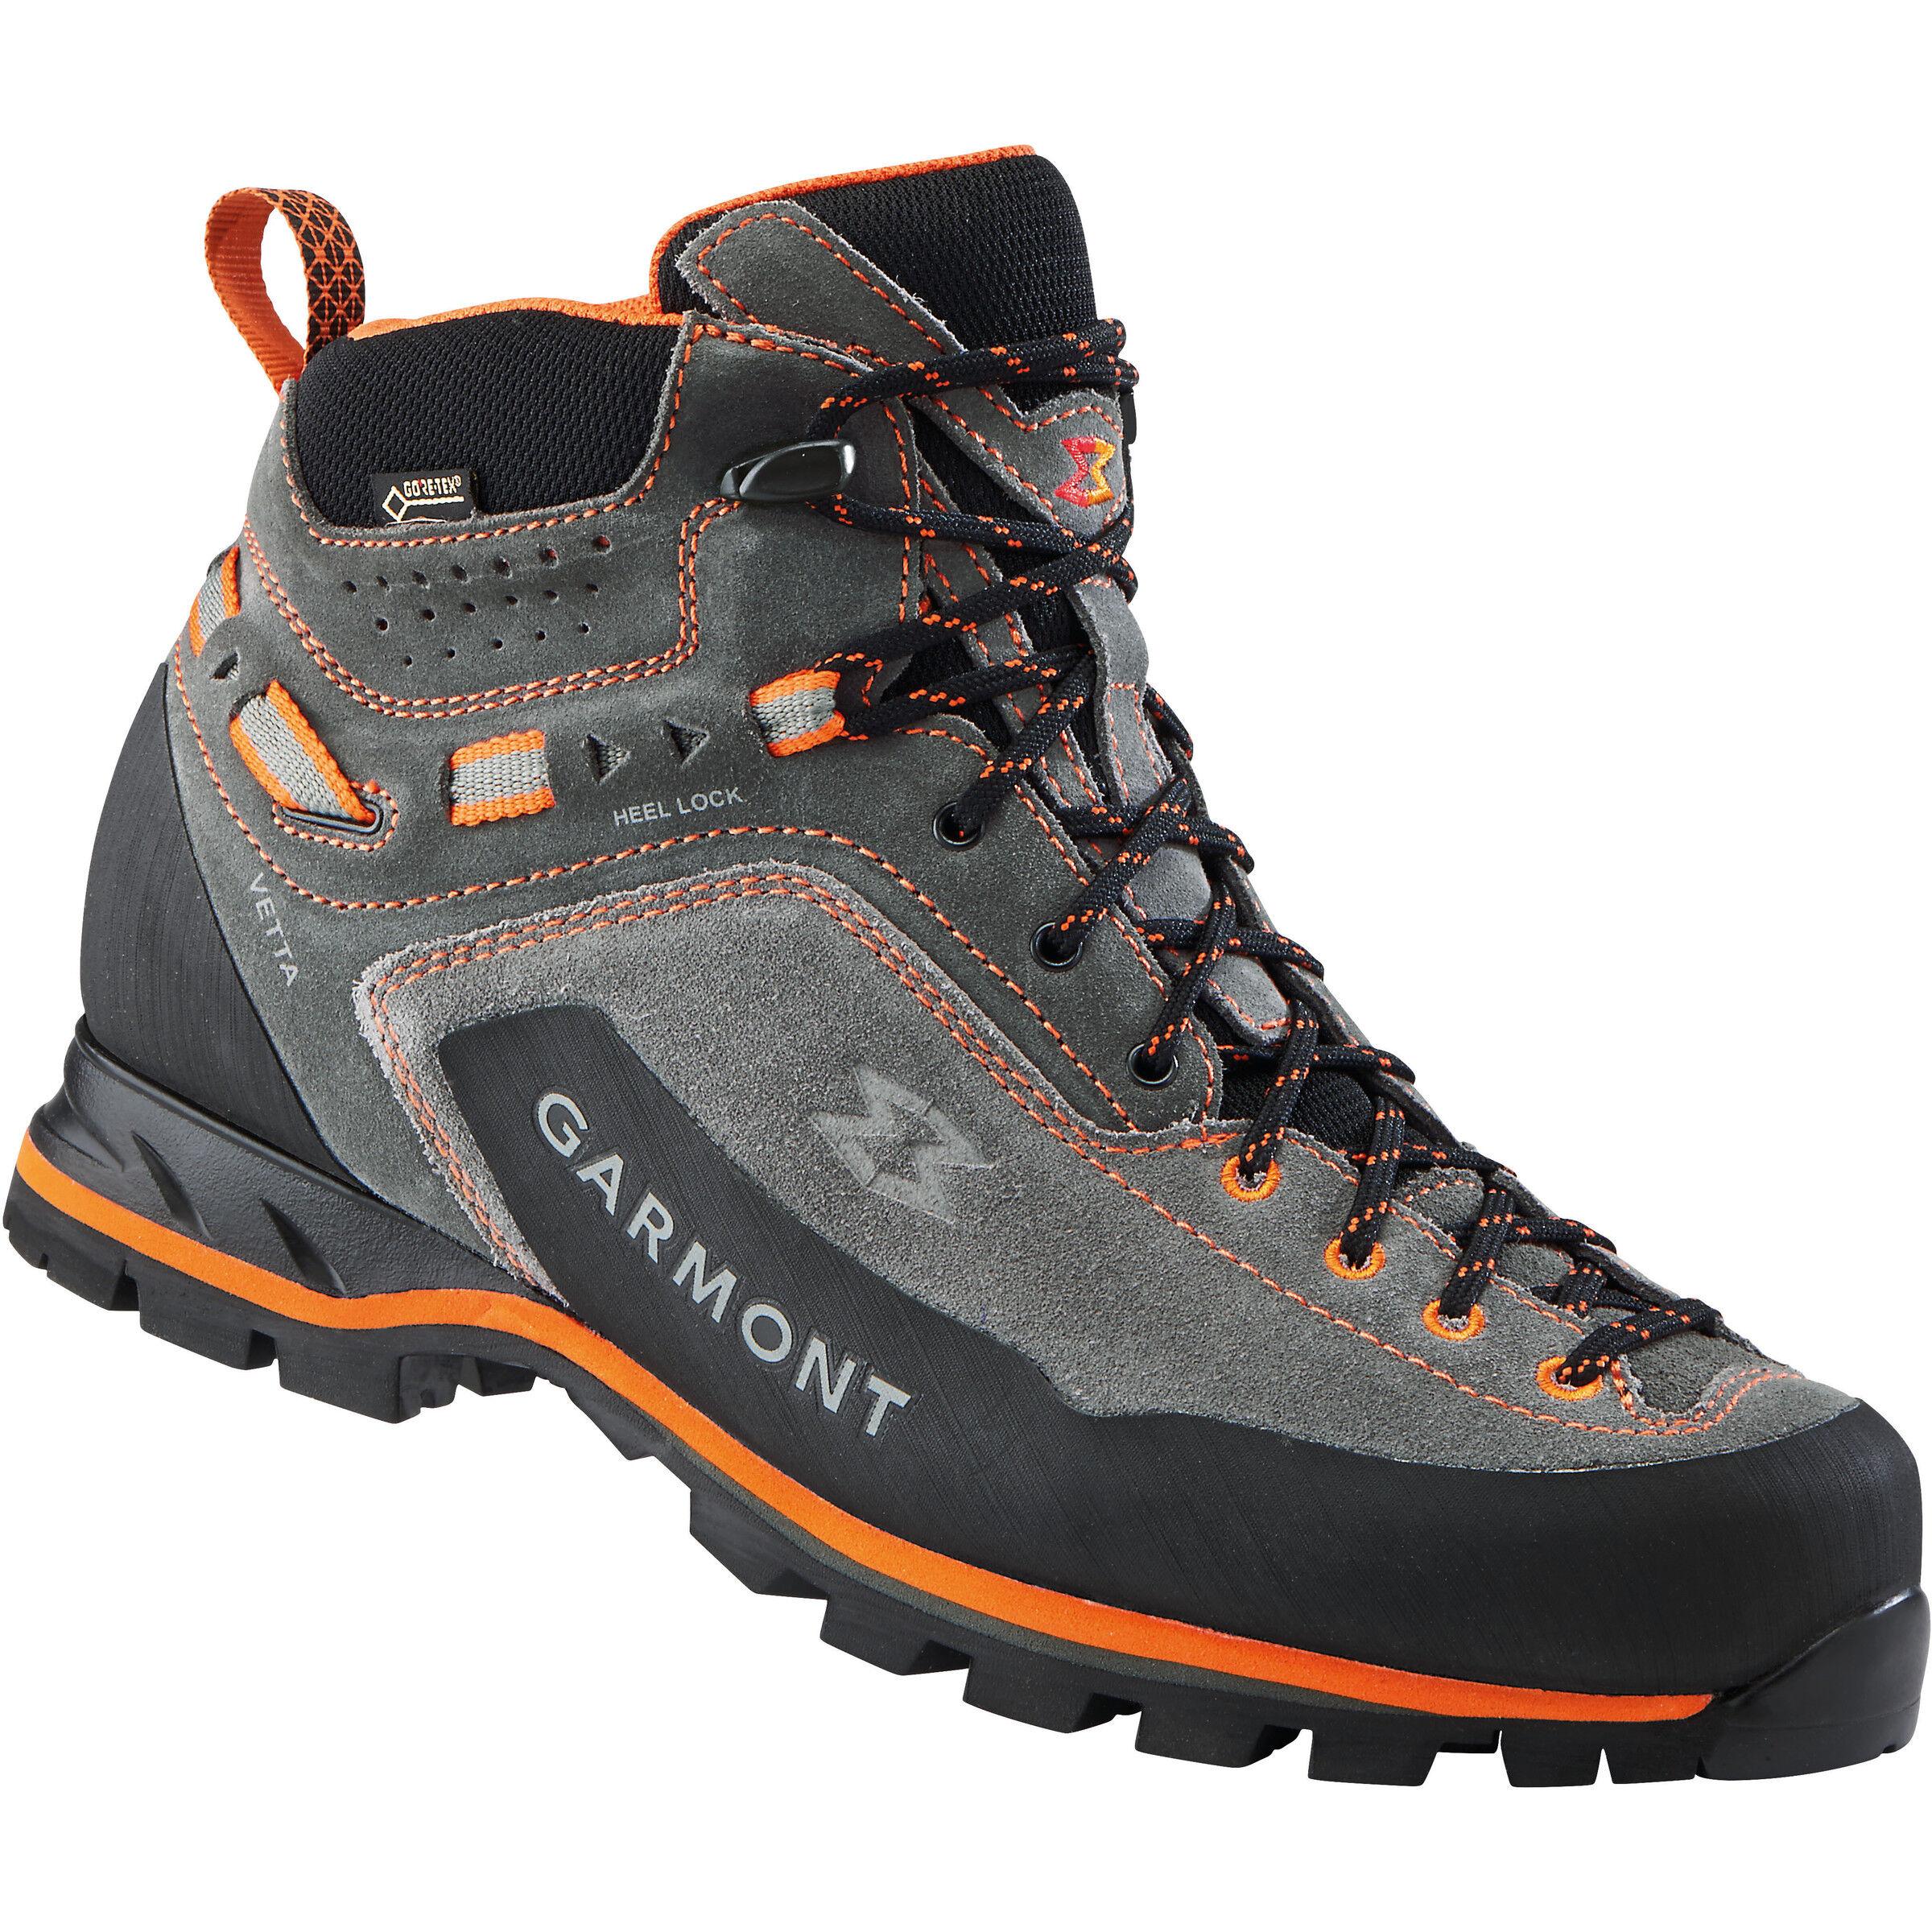 Garmont Vetta GTX Mid Cut Shoes Herren dark greyorange